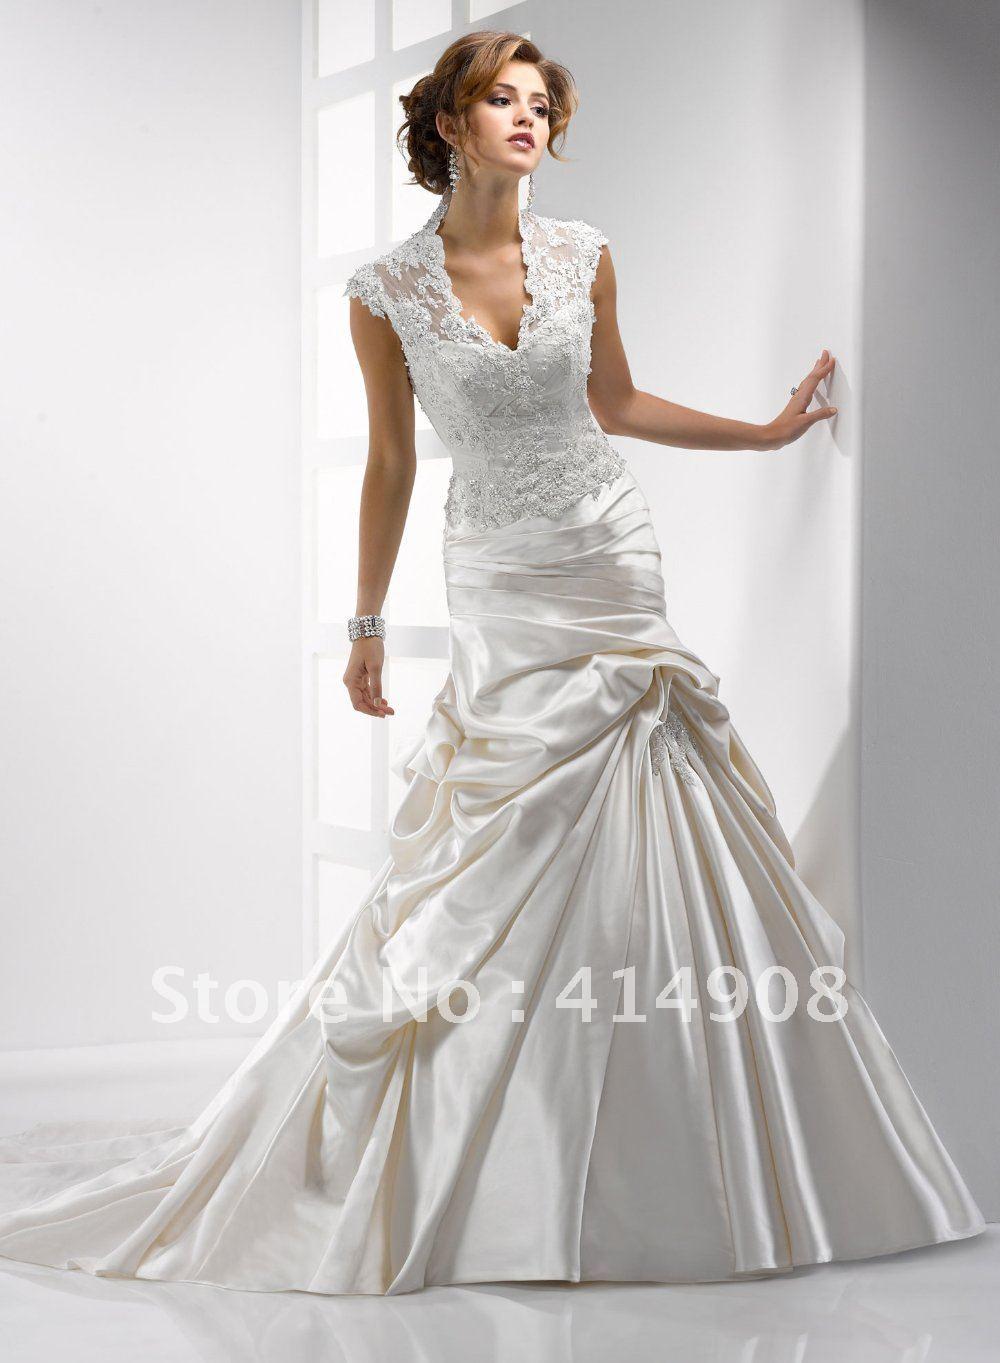 Tops for Wedding Dresses